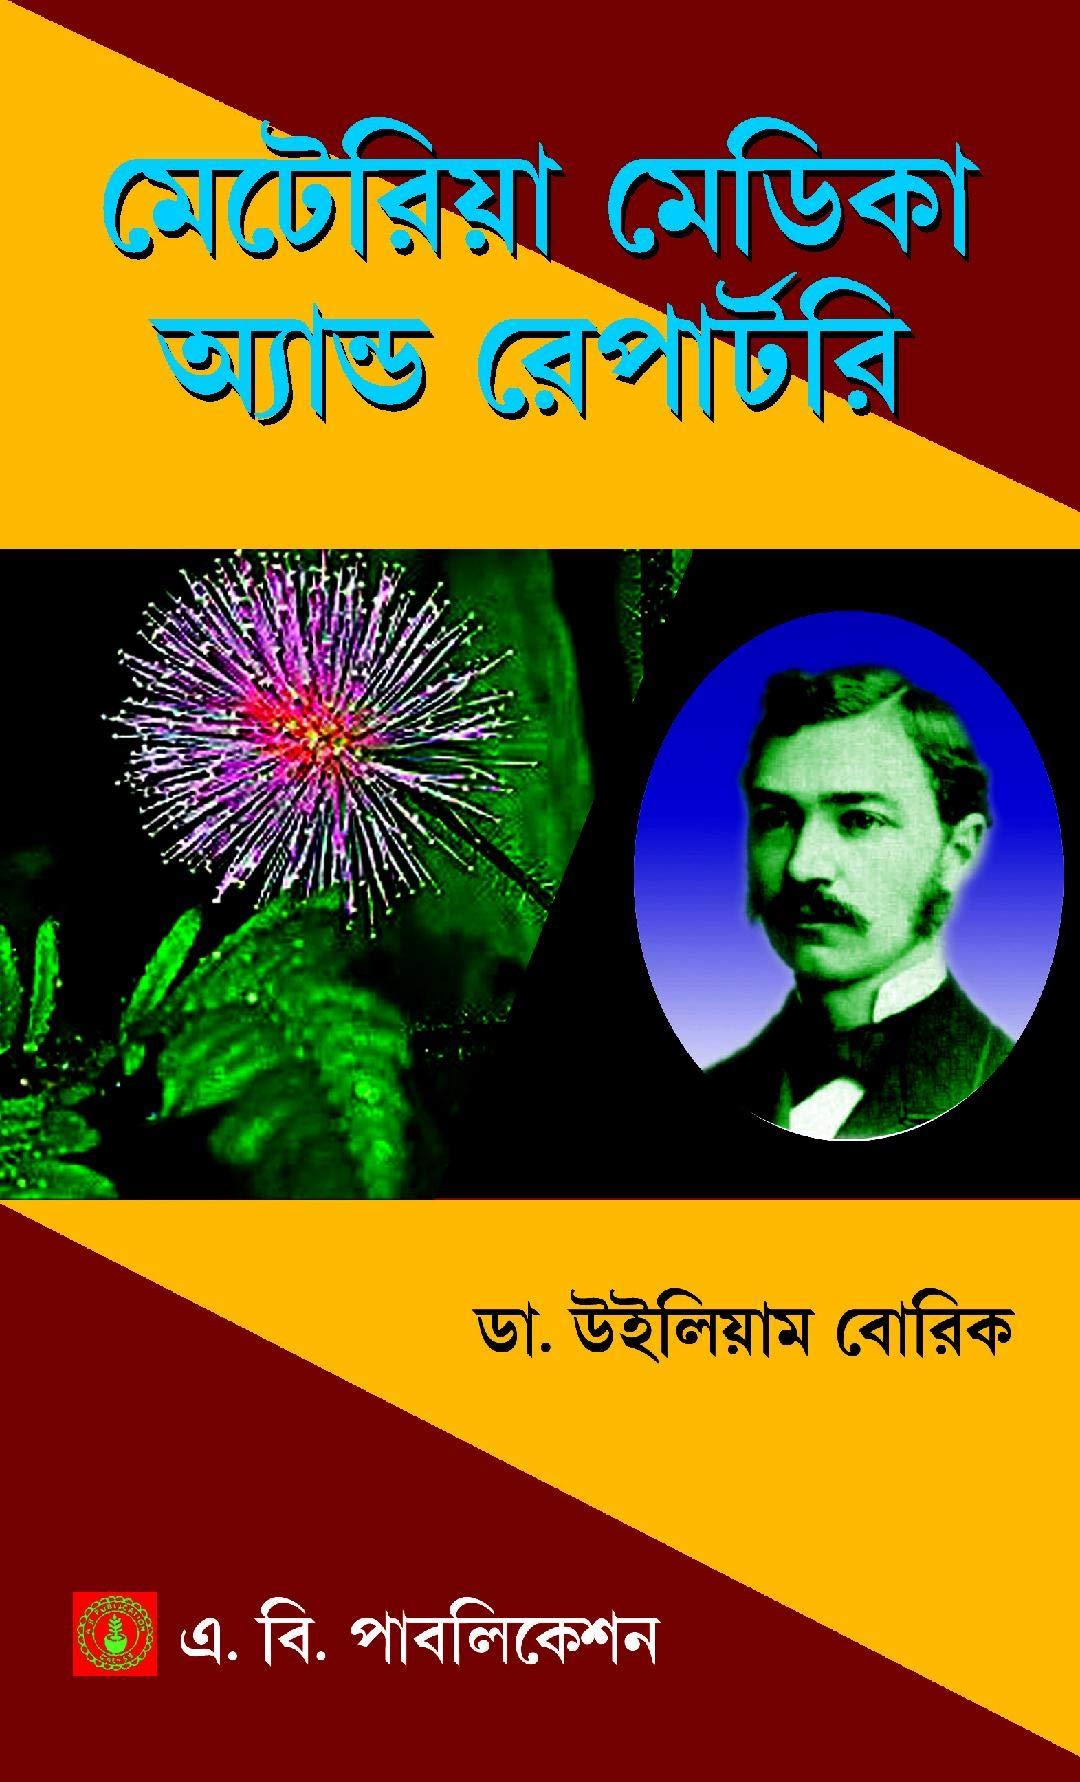 [ BENGALI MEDIUM ] Materia Medica and Repertory [Hardcover] by Dr. Wlillam Boericke